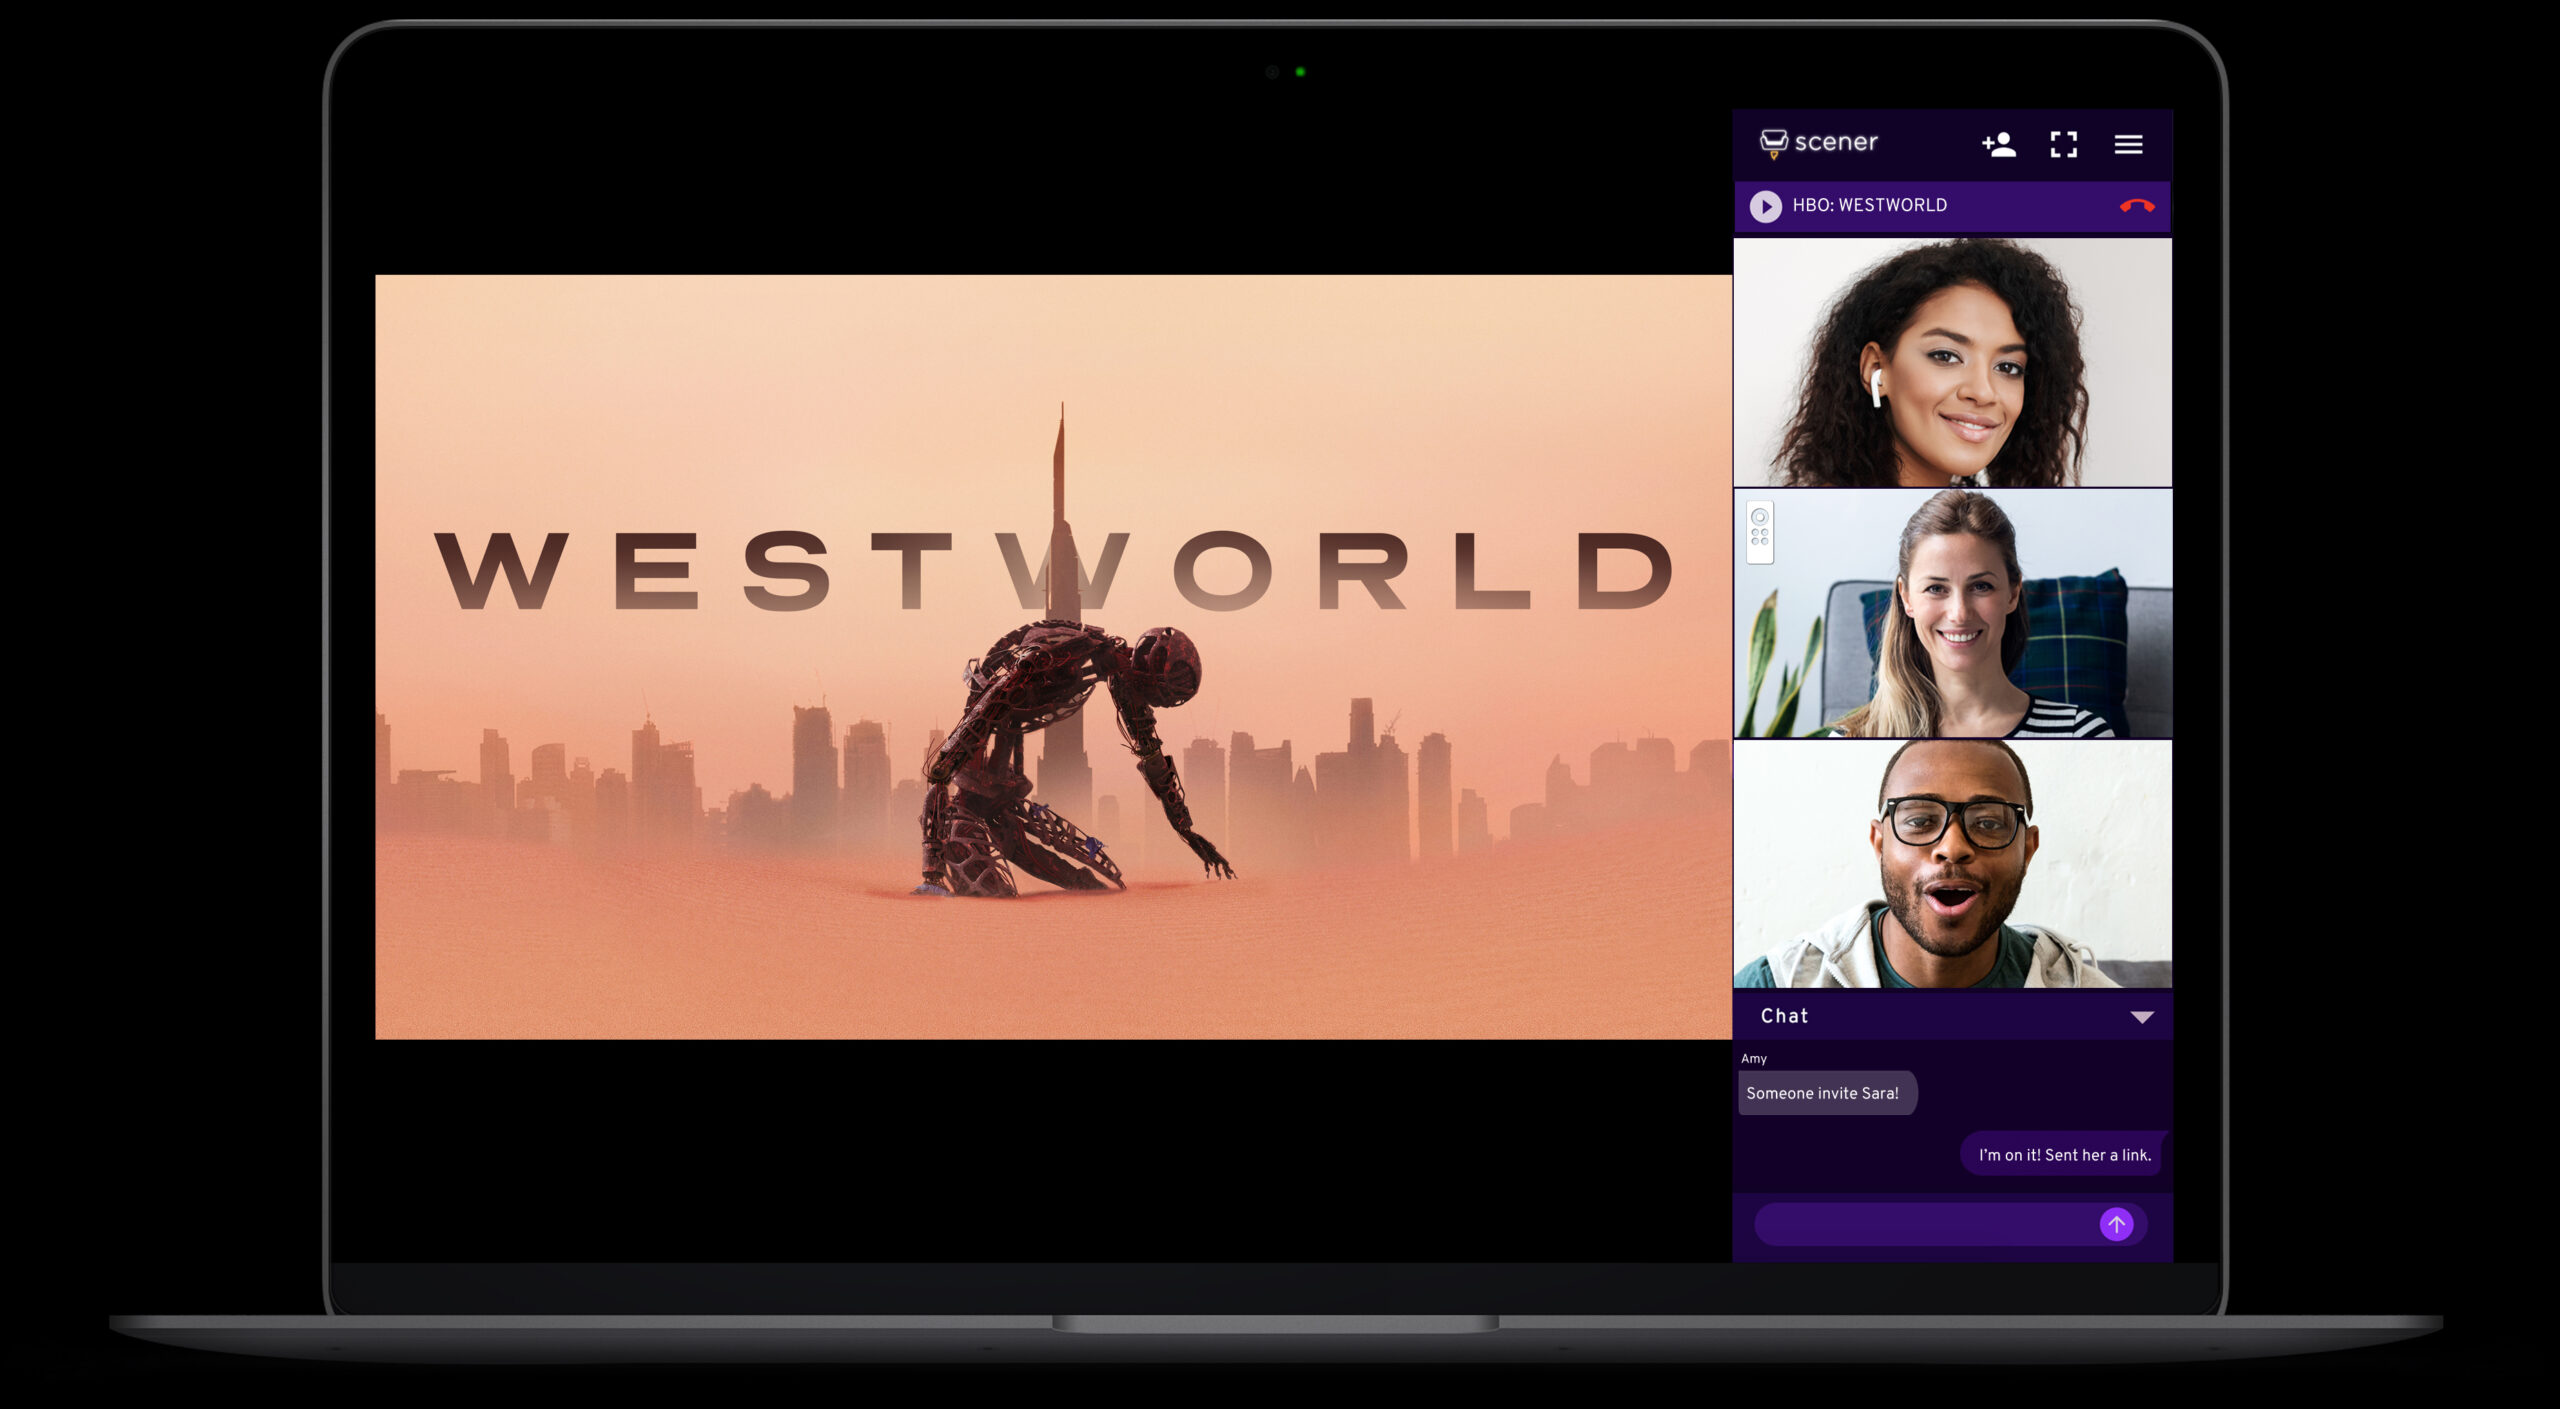 SCENER - watch movies together online